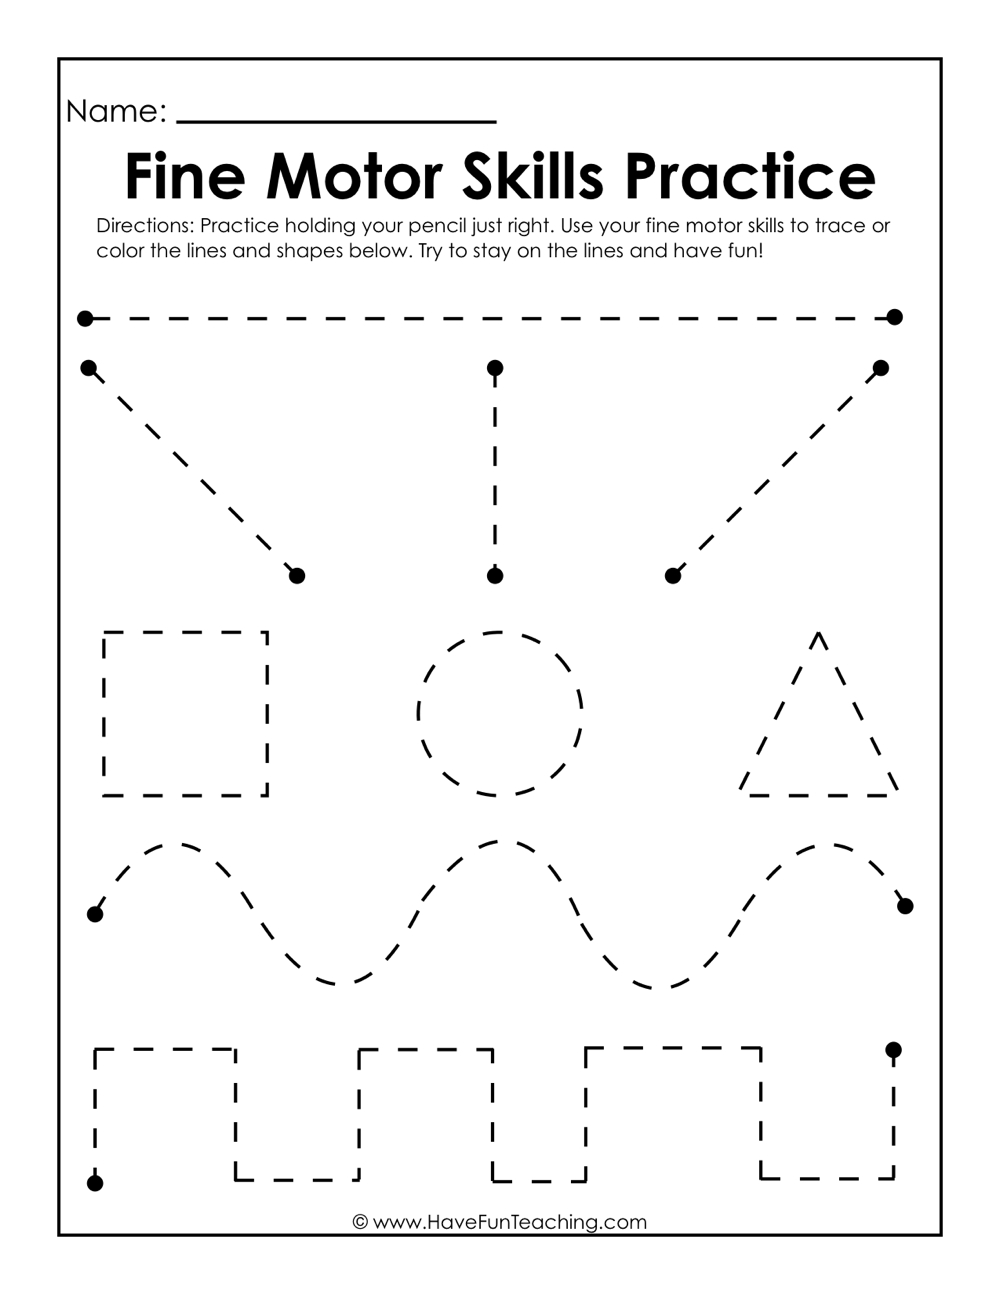 Fine Motor Skills Practice Worksheet